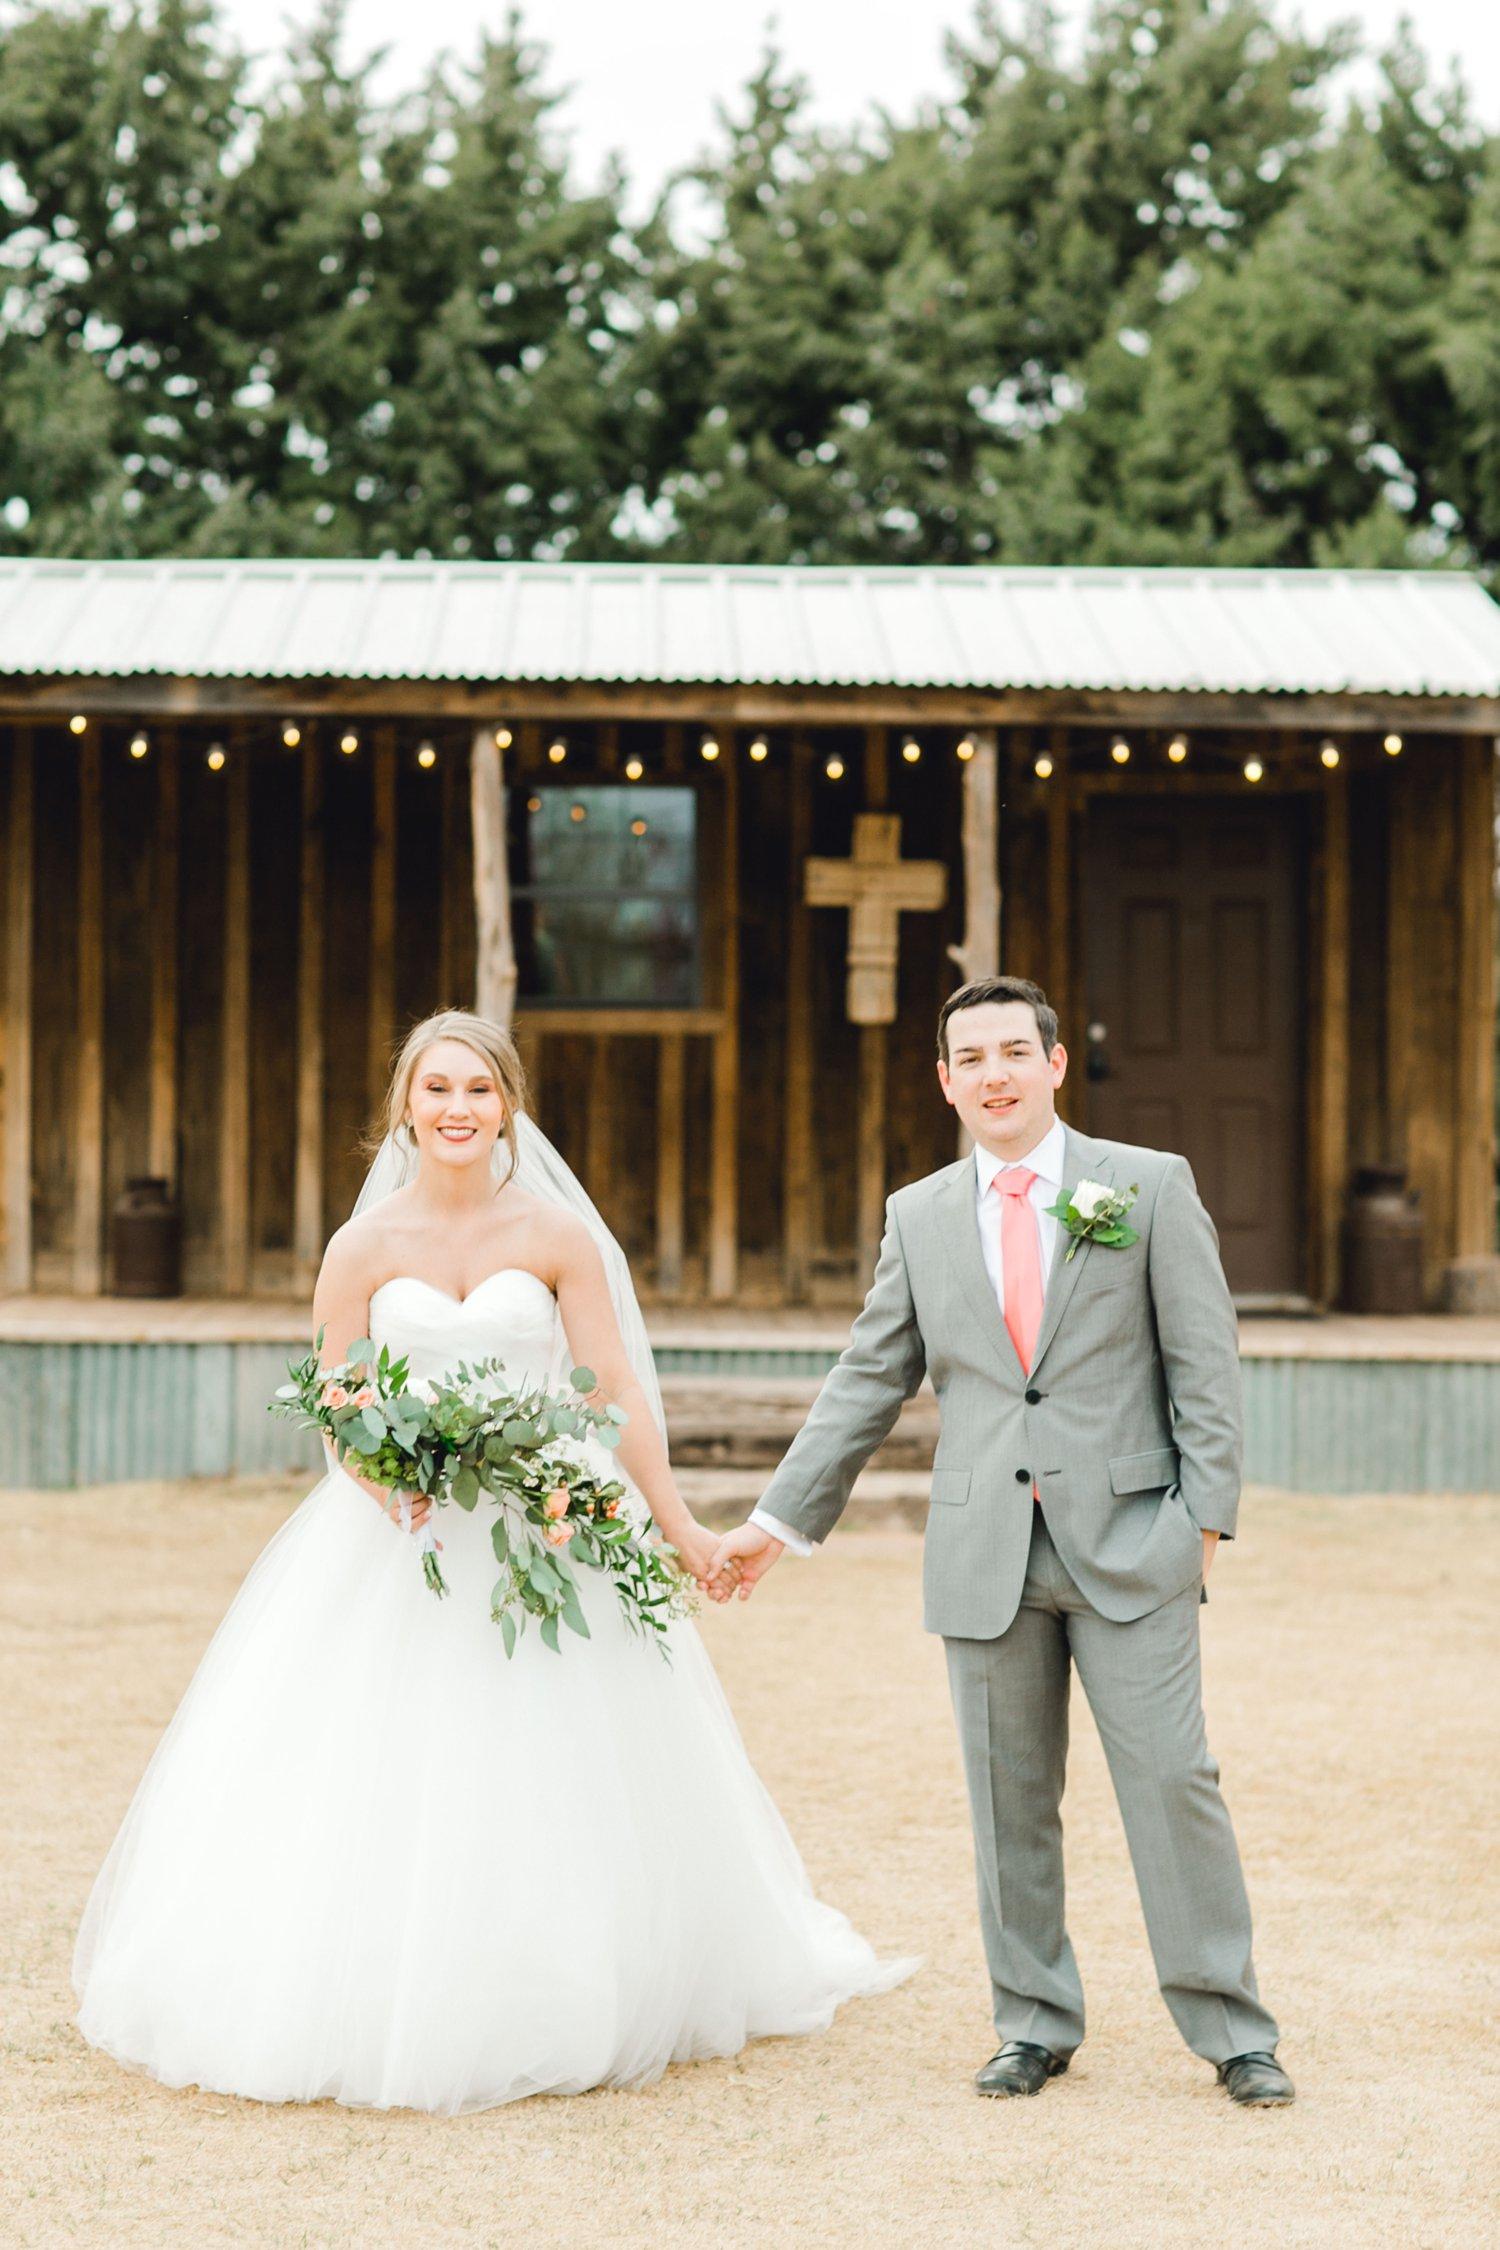 kayla-jacob-dow-cotton-creek-barn-lubbock-wedding-photographer-alleej0098.jpg